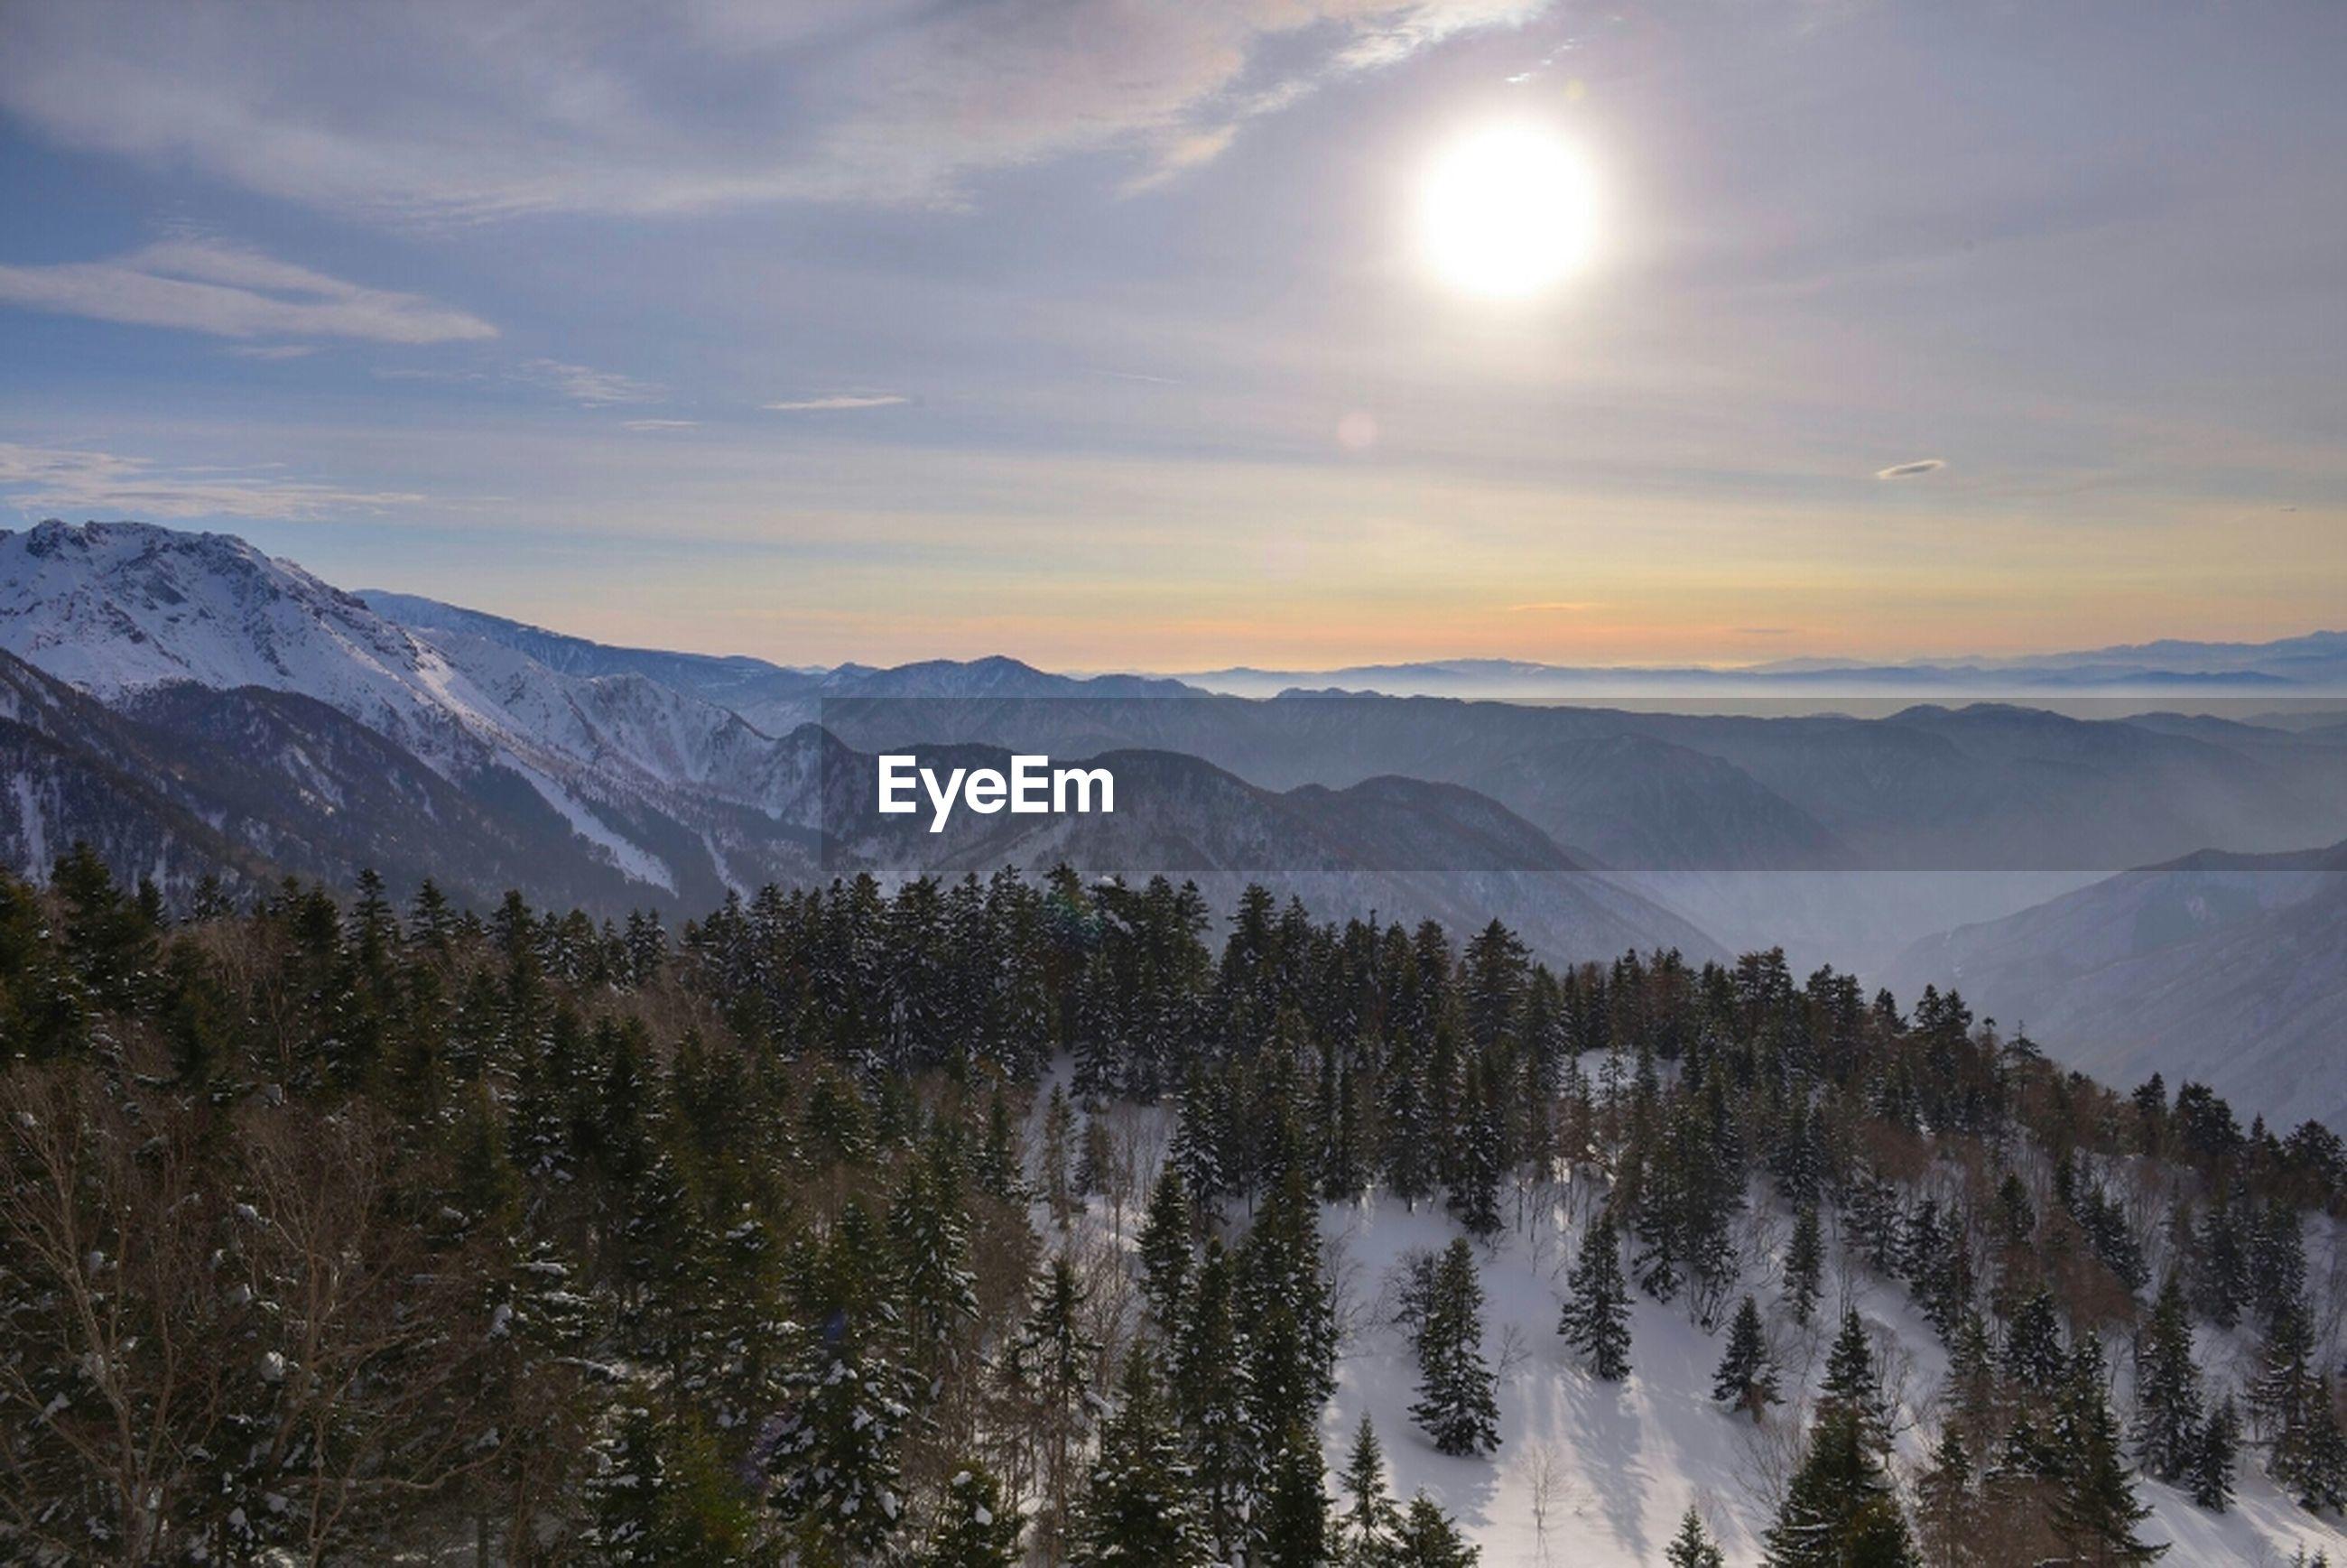 mountain, tranquil scene, mountain range, tranquility, scenics, beauty in nature, snow, winter, cold temperature, sun, sky, nature, landscape, season, sunlight, idyllic, cloud - sky, weather, sunset, non-urban scene